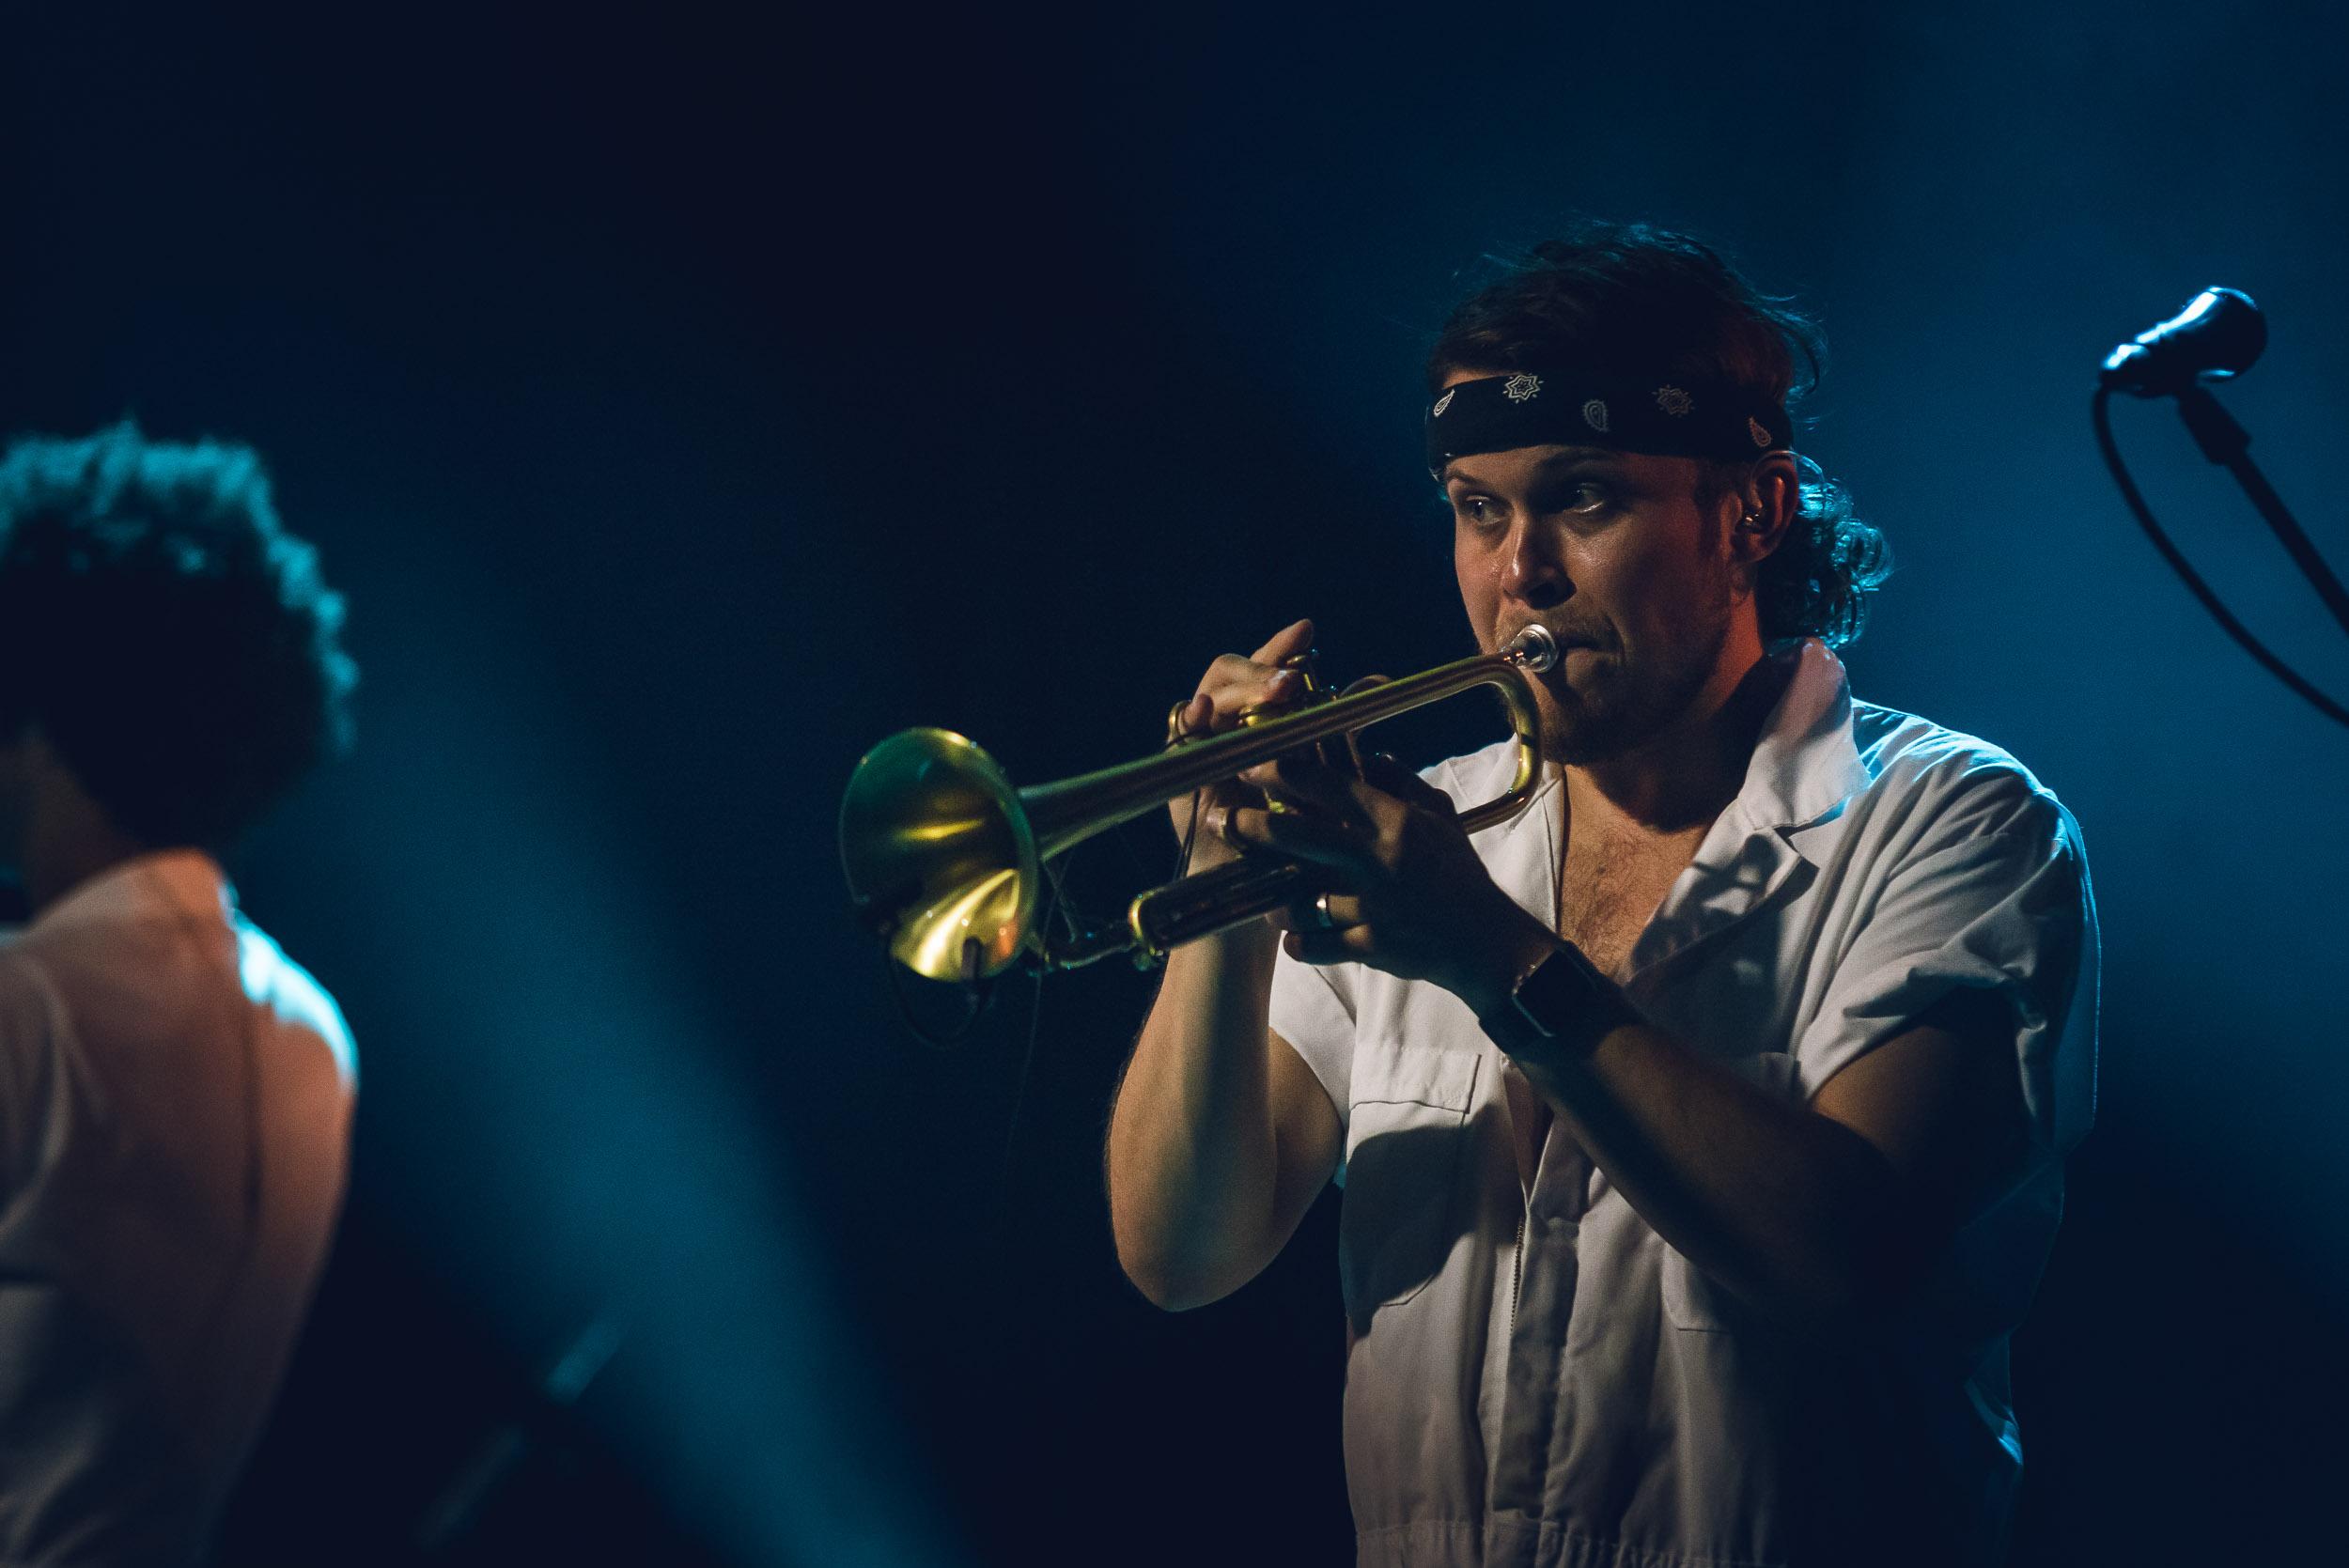 Brass-Against-Tomas-Valnoha-12-.jpg